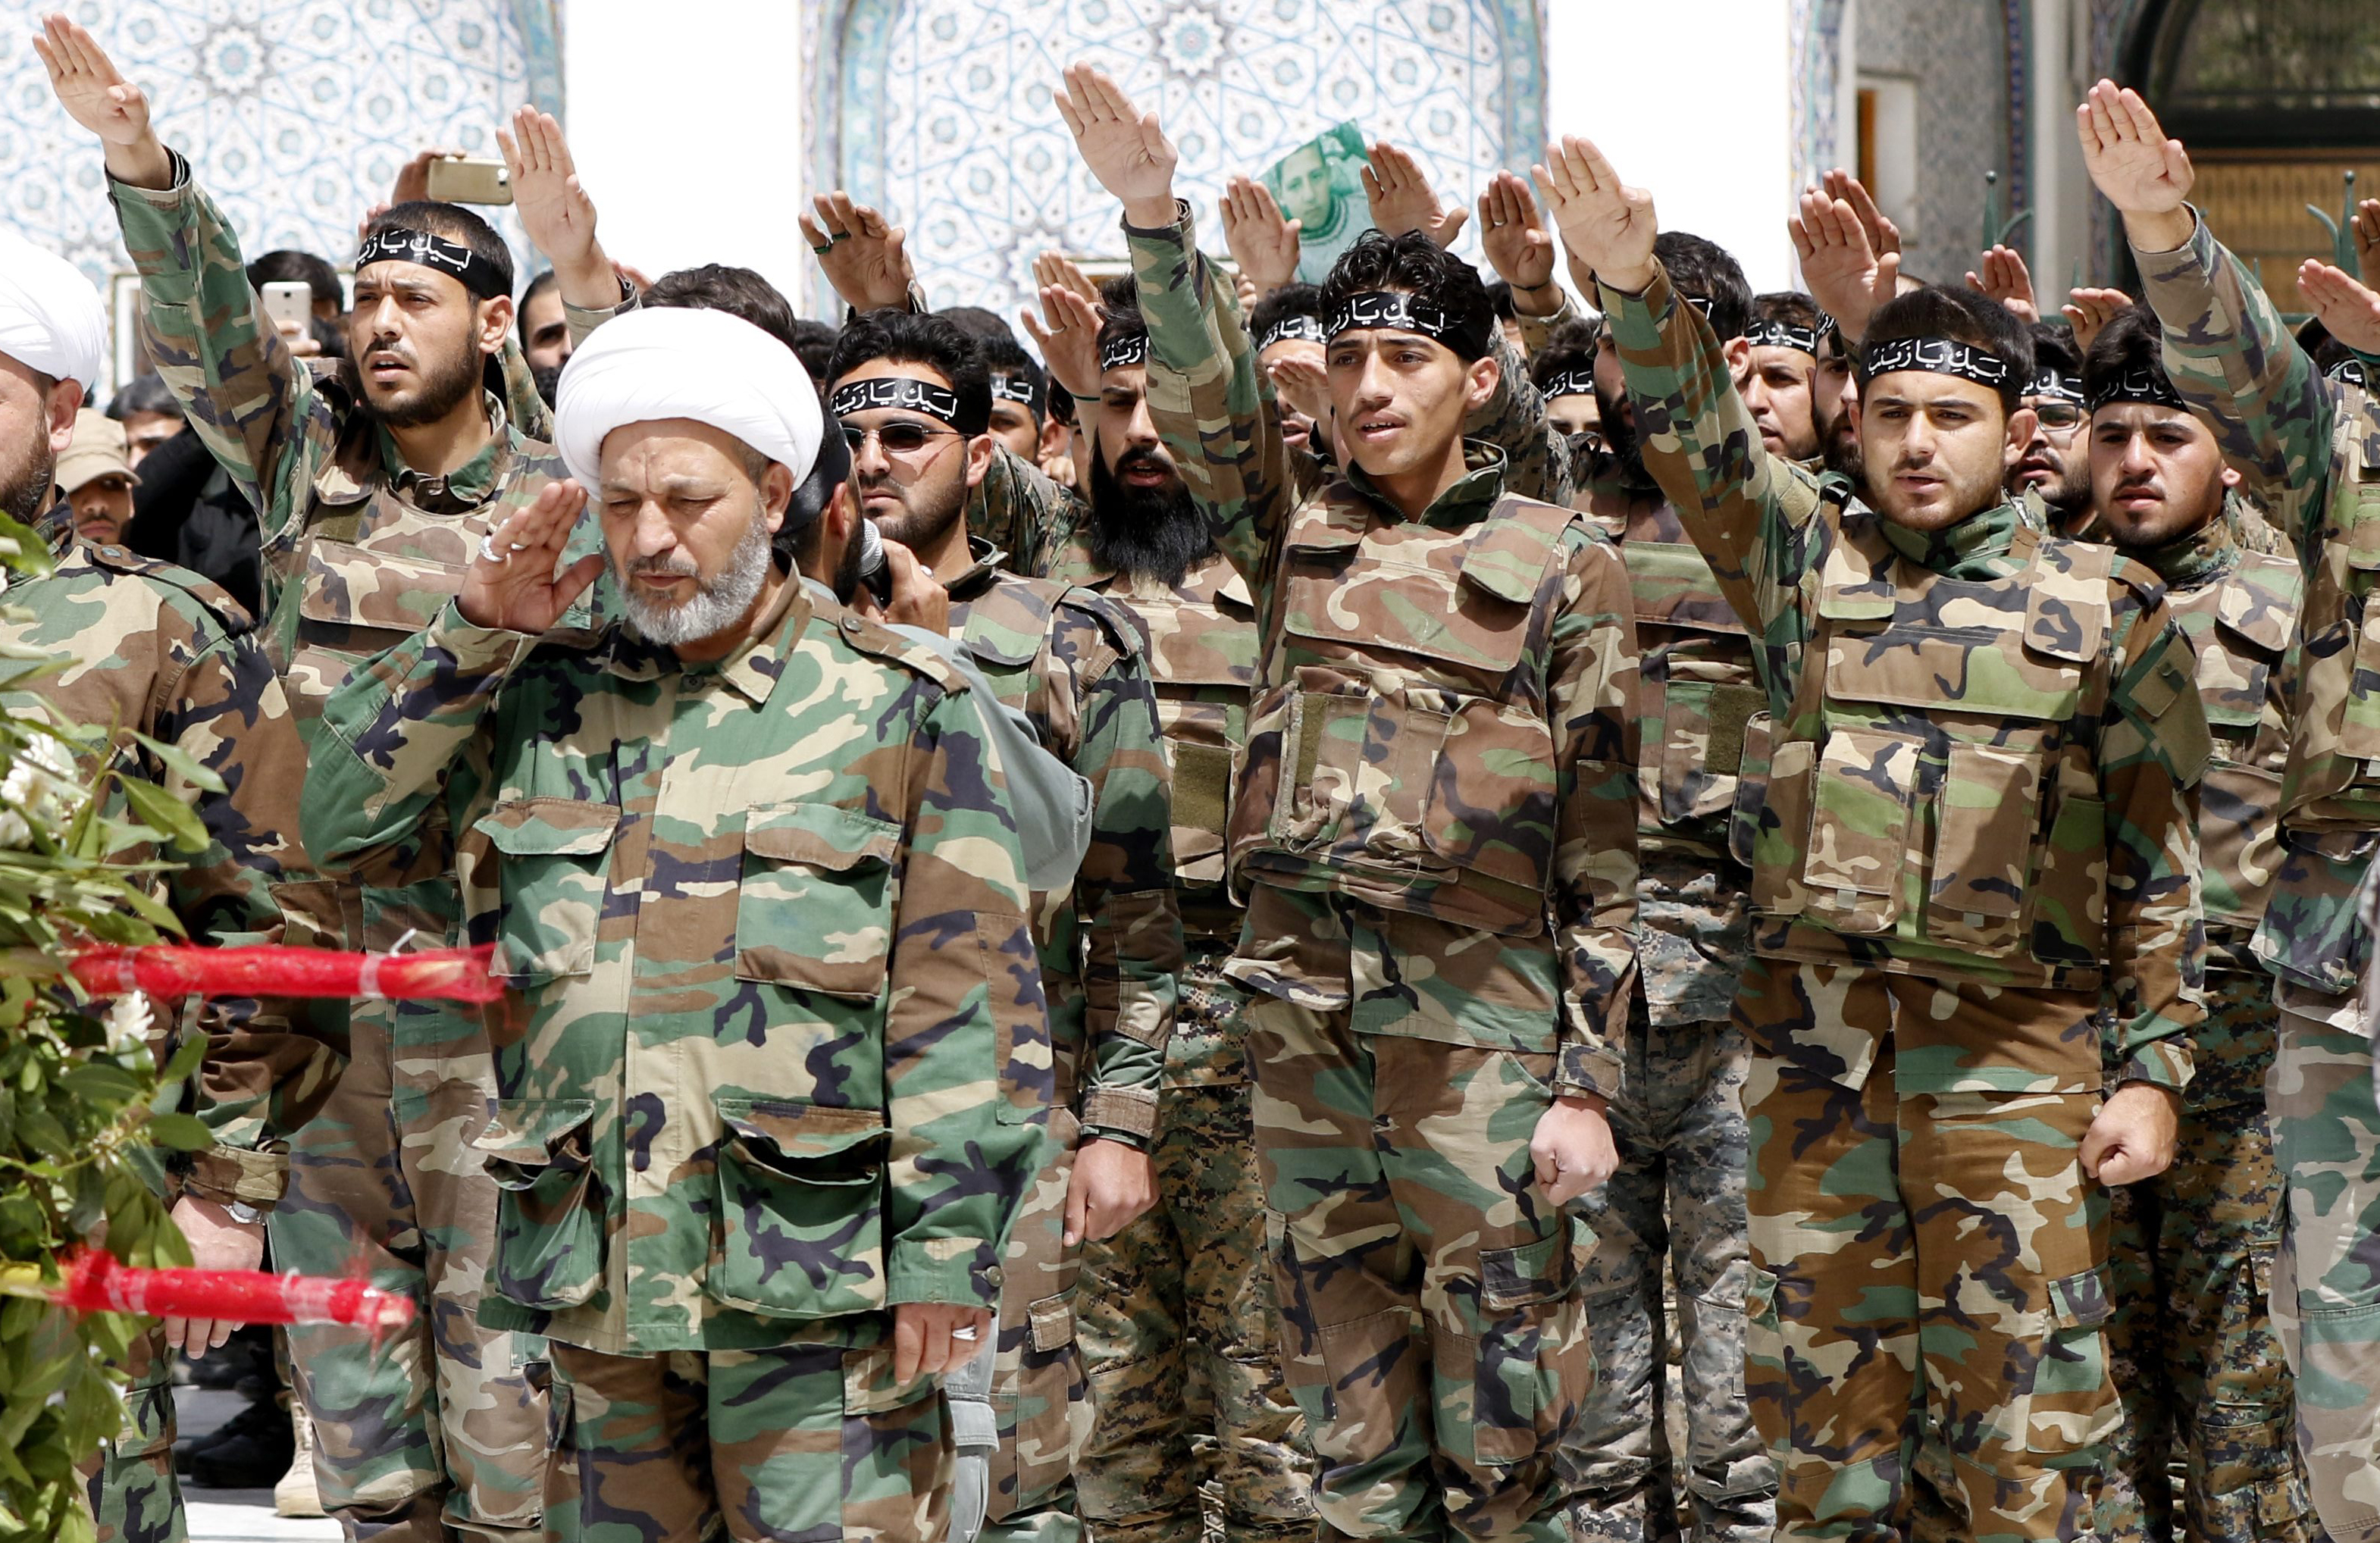 Iran manipulates Pakistani Shia to satisfy 'nefarious' geopolitical agenda